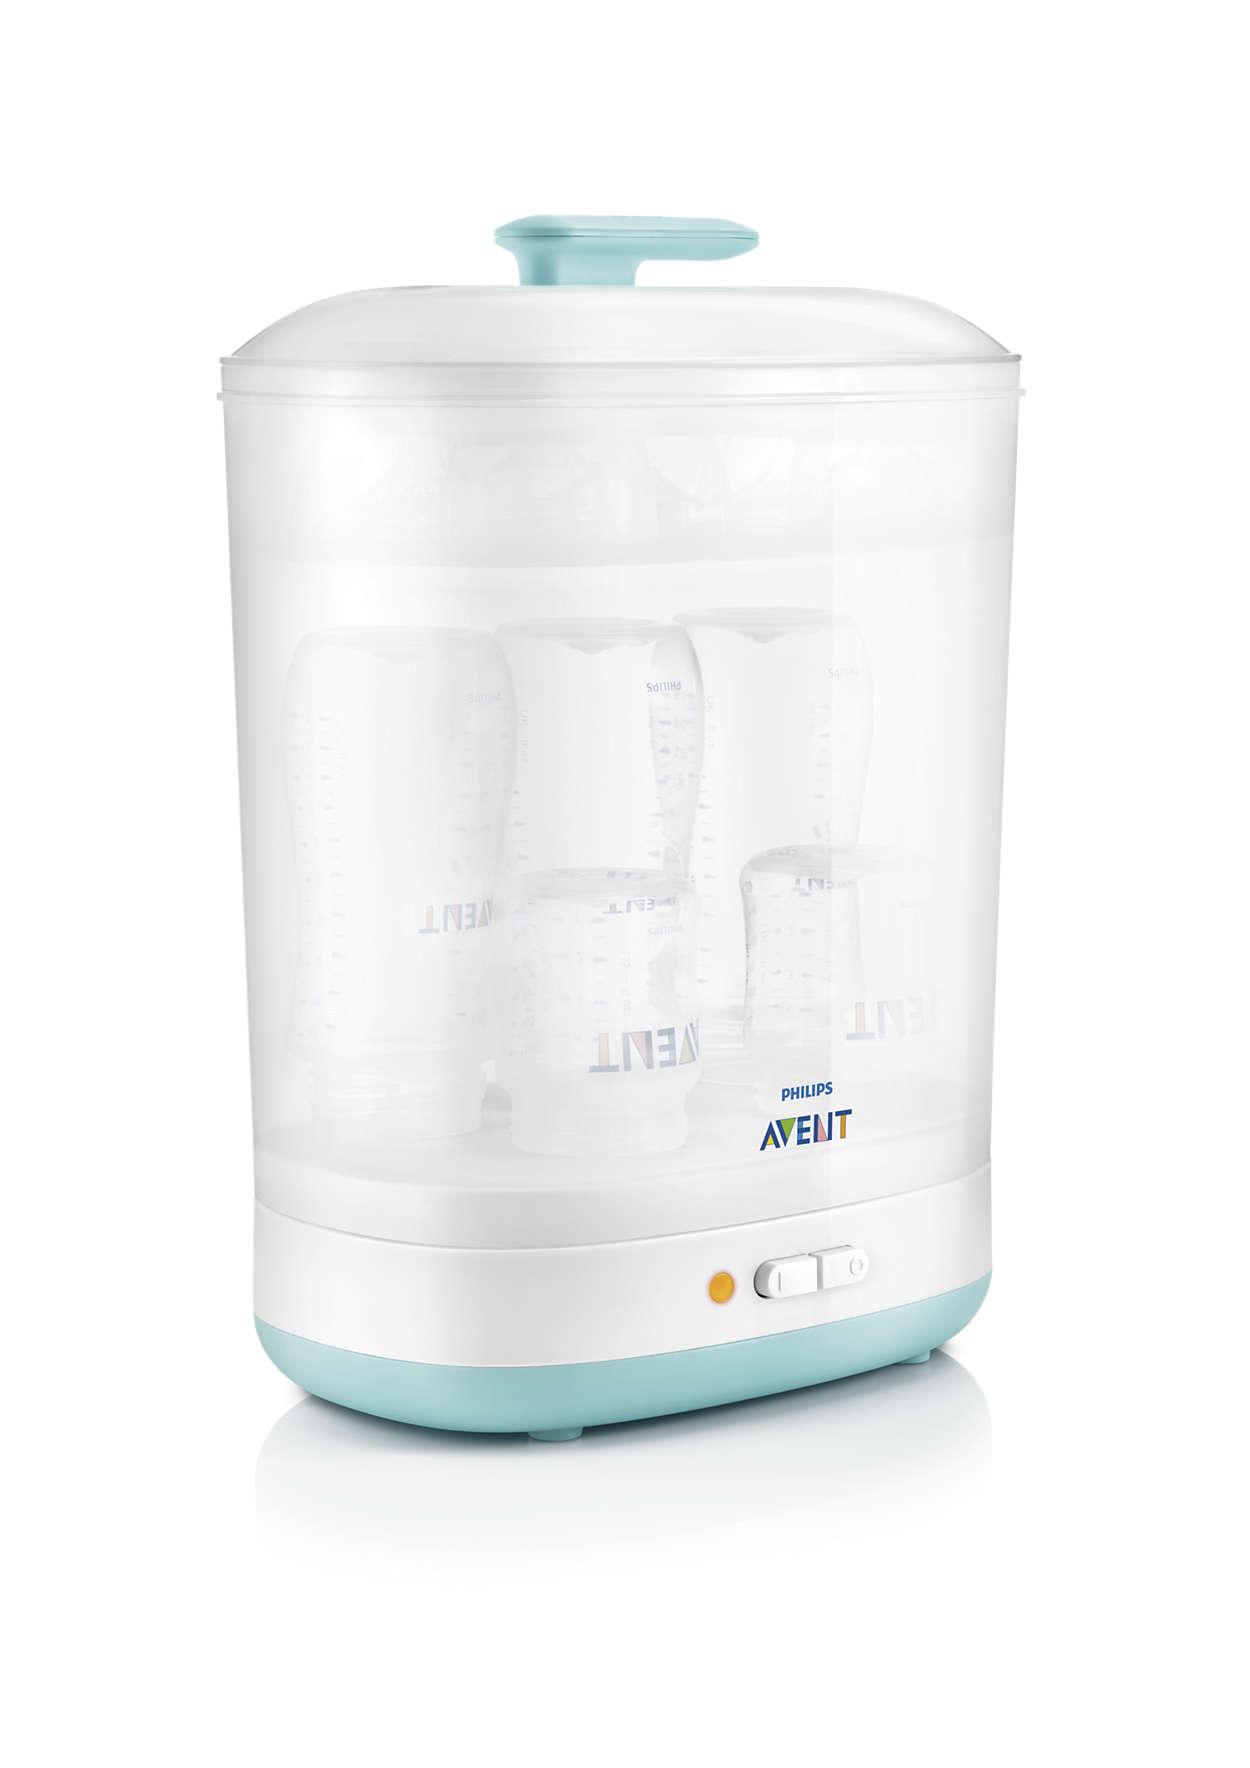 Microwave steam sterilizer scf281/05 | avent.